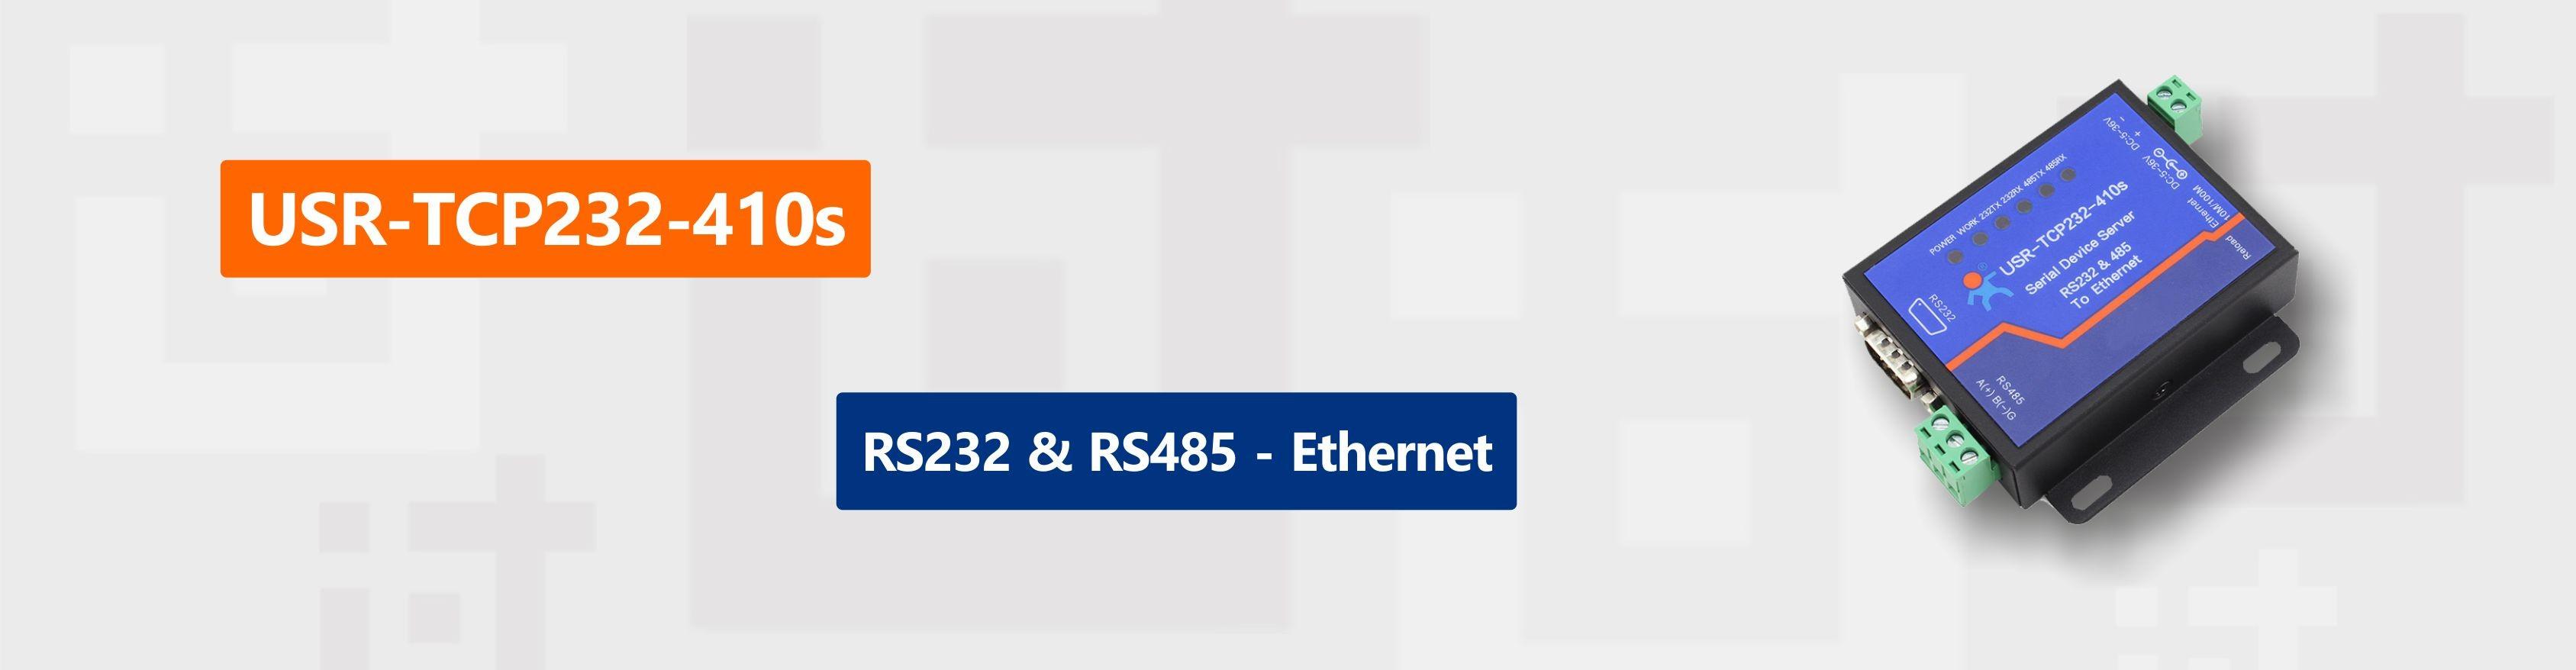 USR-TCP232-410S